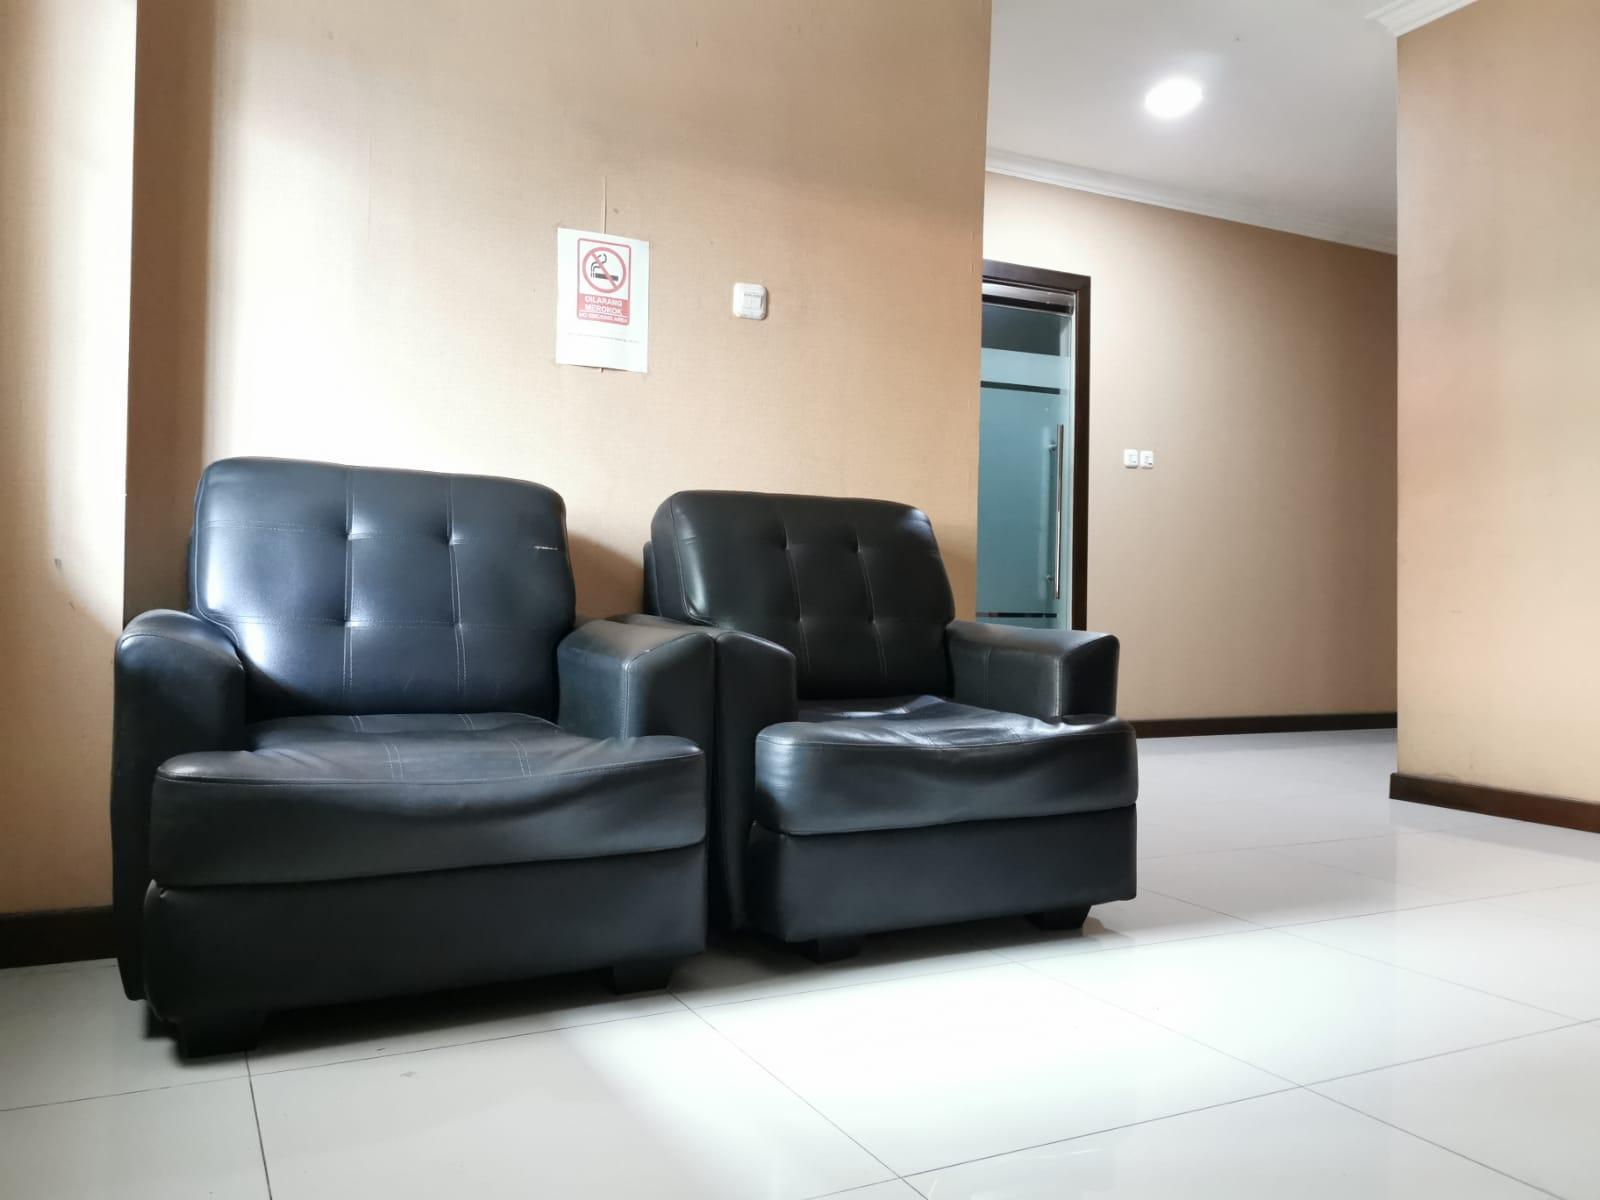 Ruang Tunggu Tamu